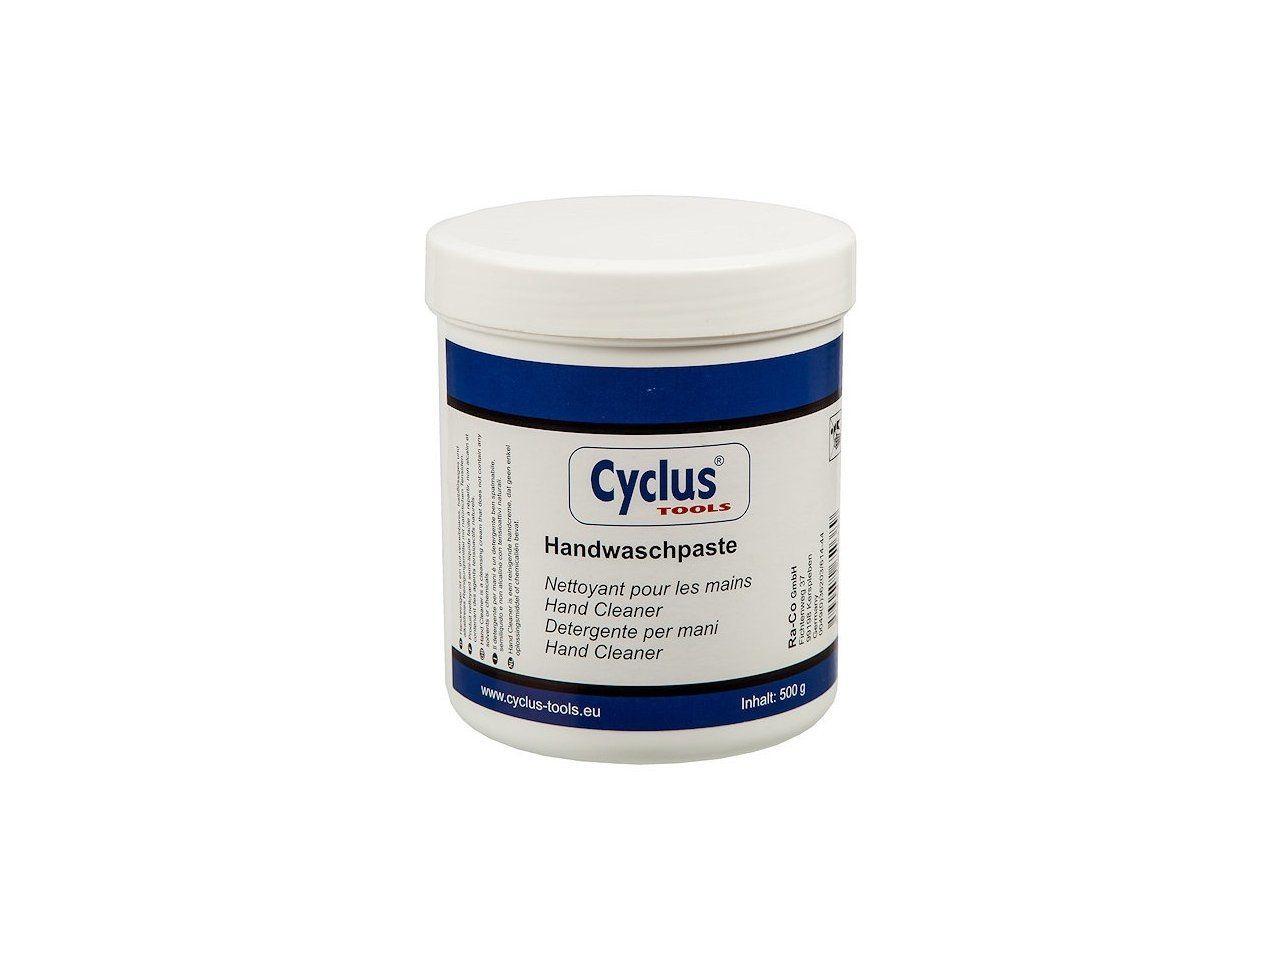 PASTA PARA LIMPEZA DAS MÃOS - 500G CYCLUS TOOLS - 710025